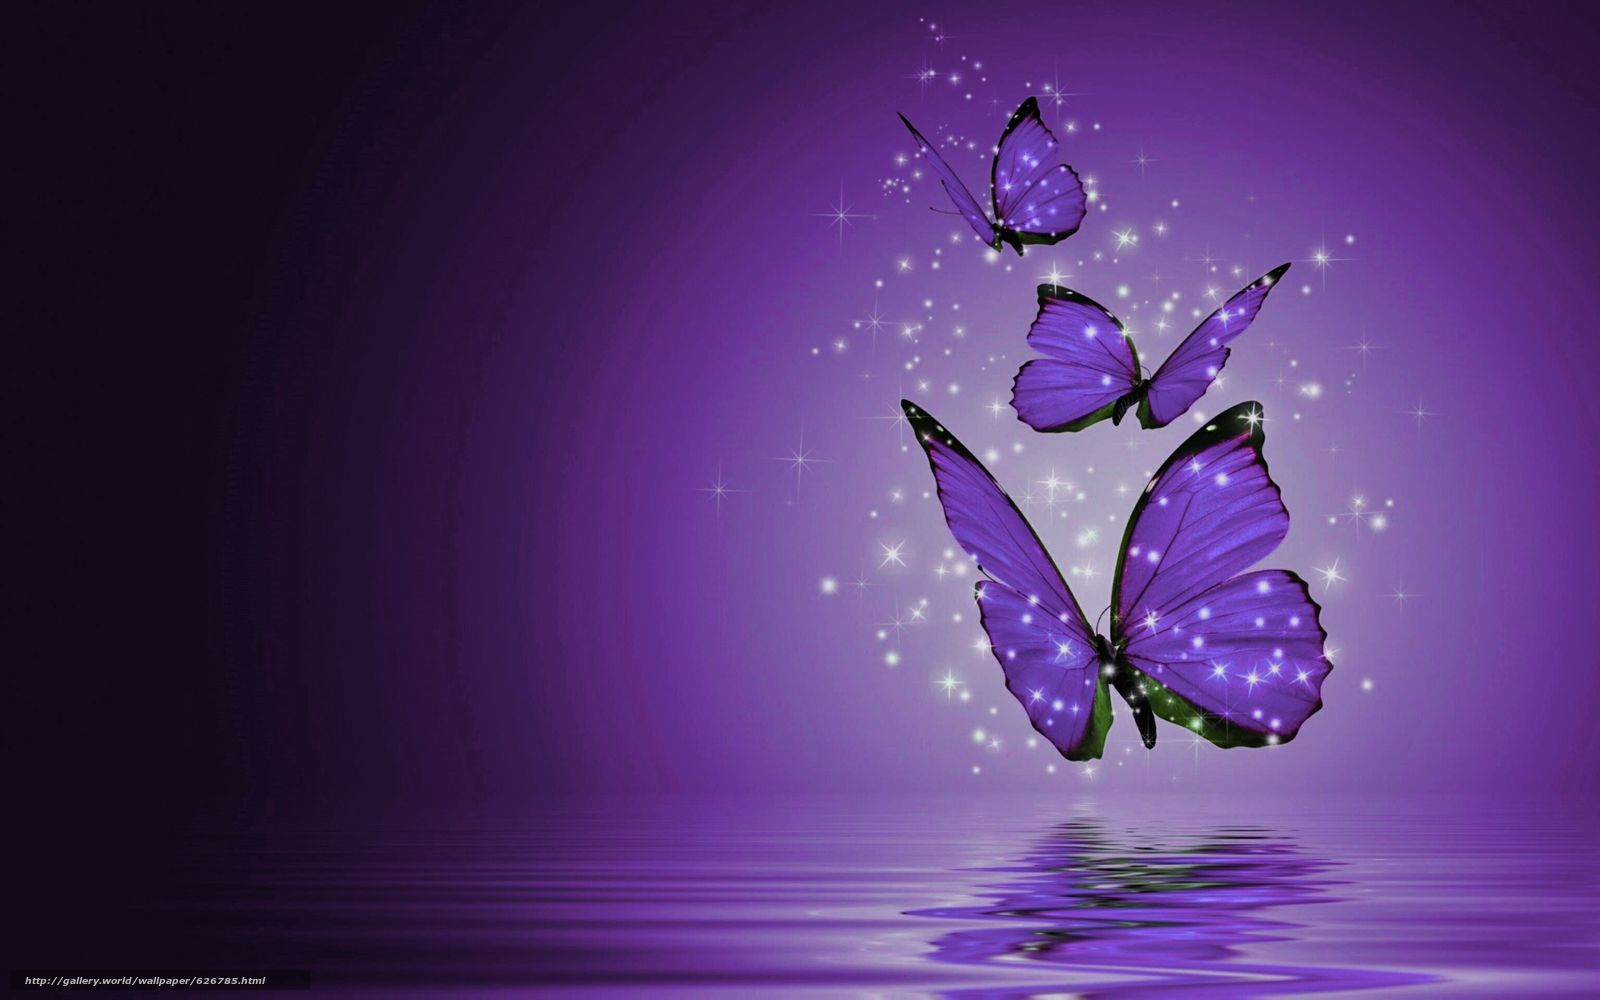 Tlcharger fond d 39 ecran papillons papillons 3d fonds d for Sfondi pc in 3d